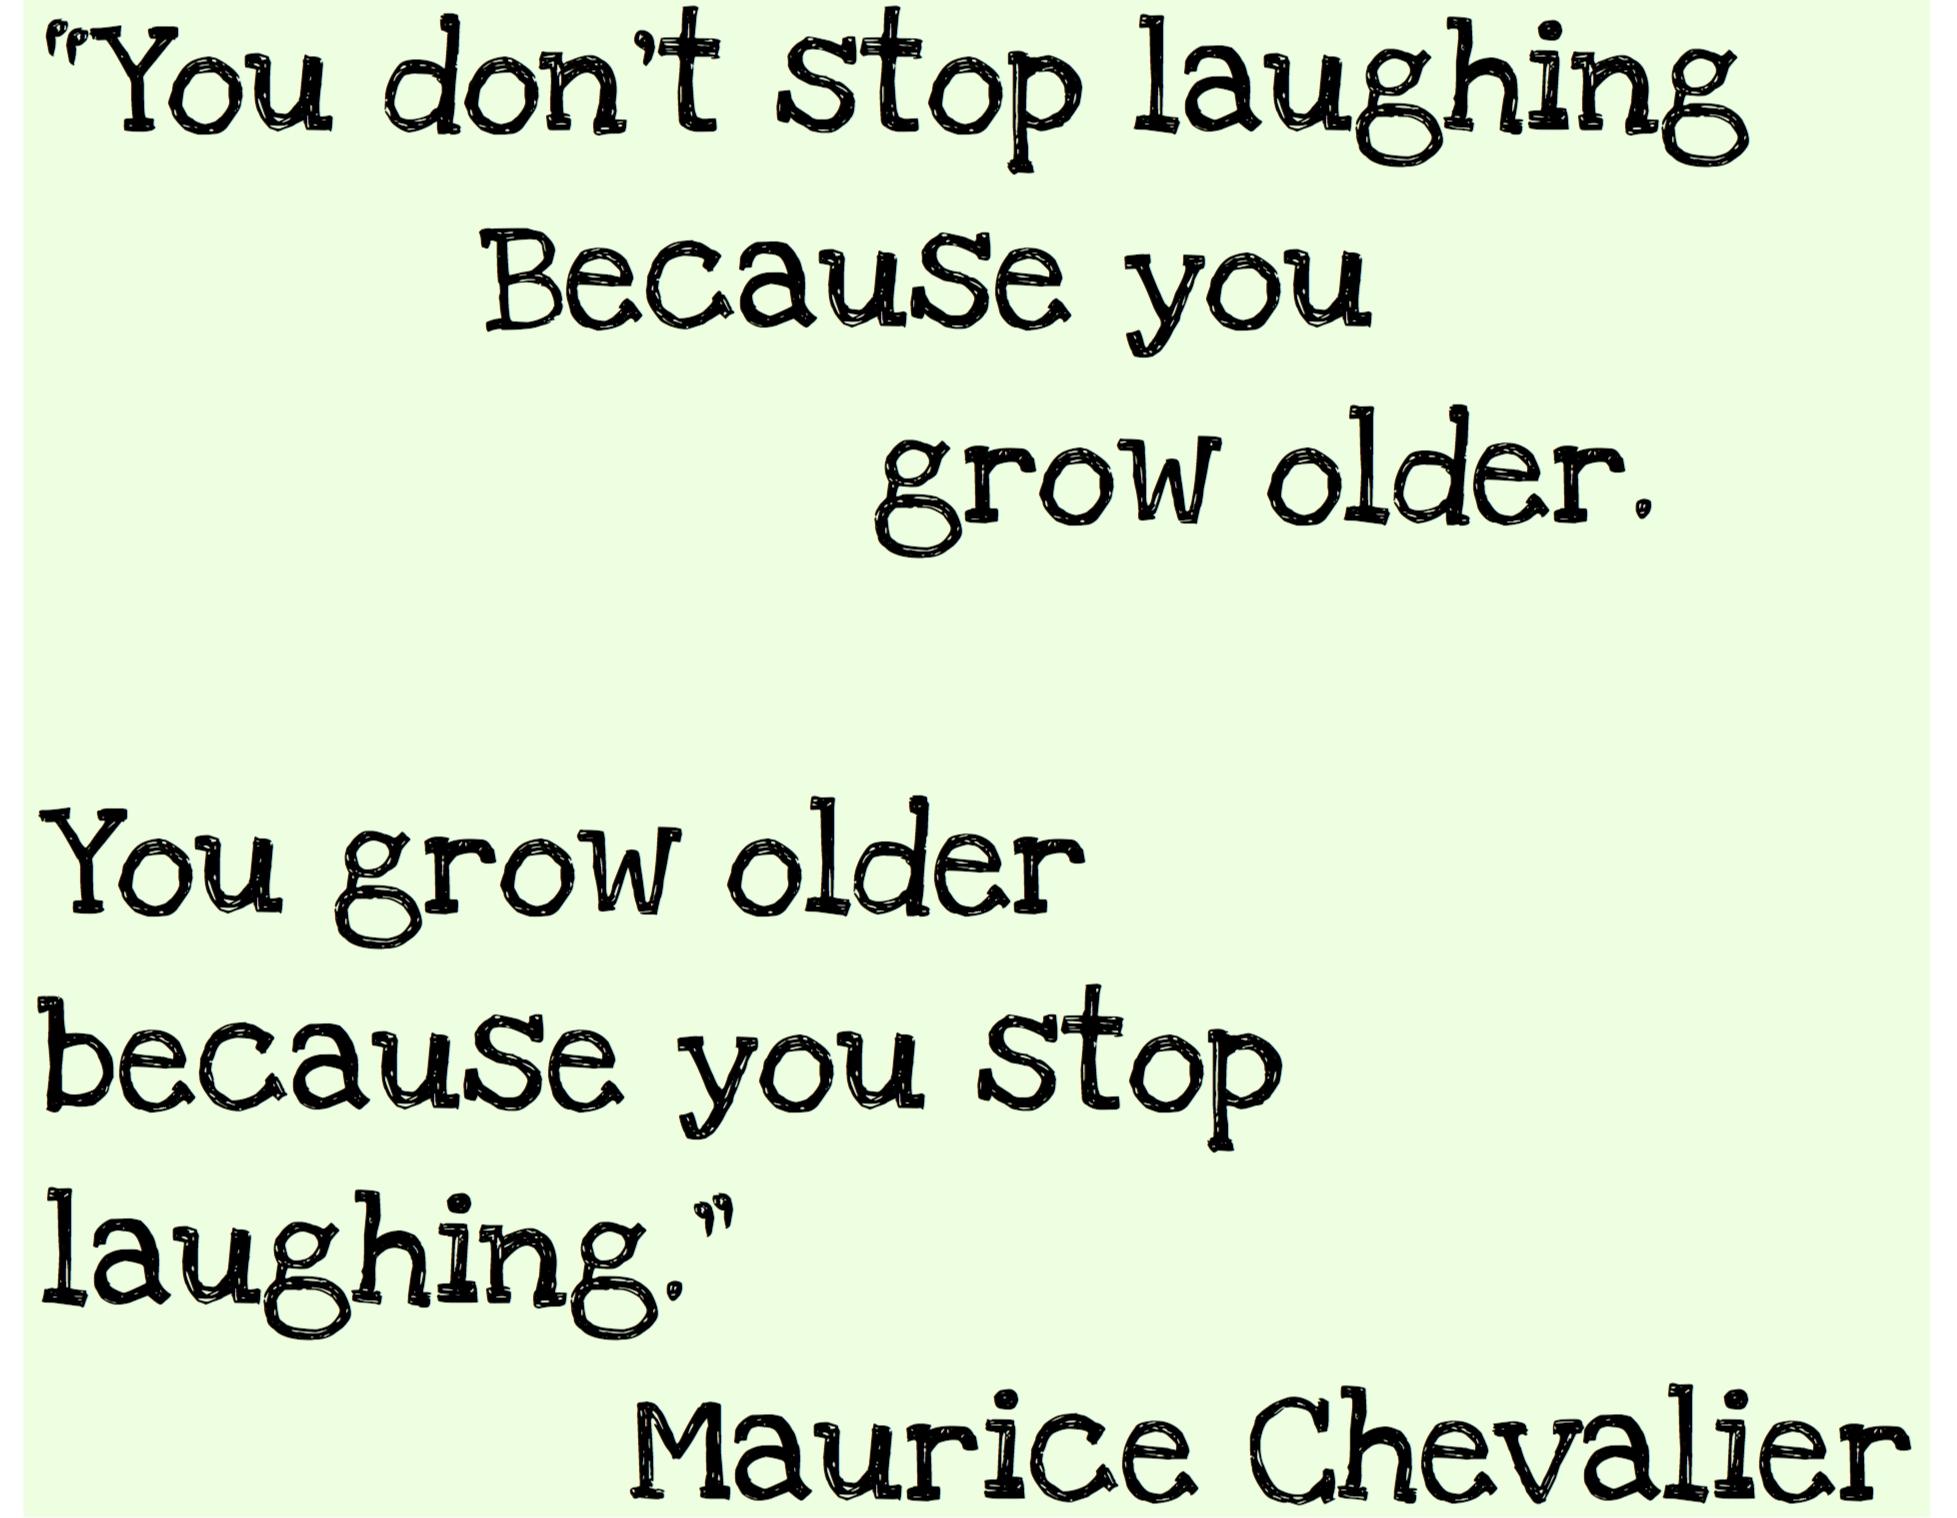 Chevalier quote.jpg